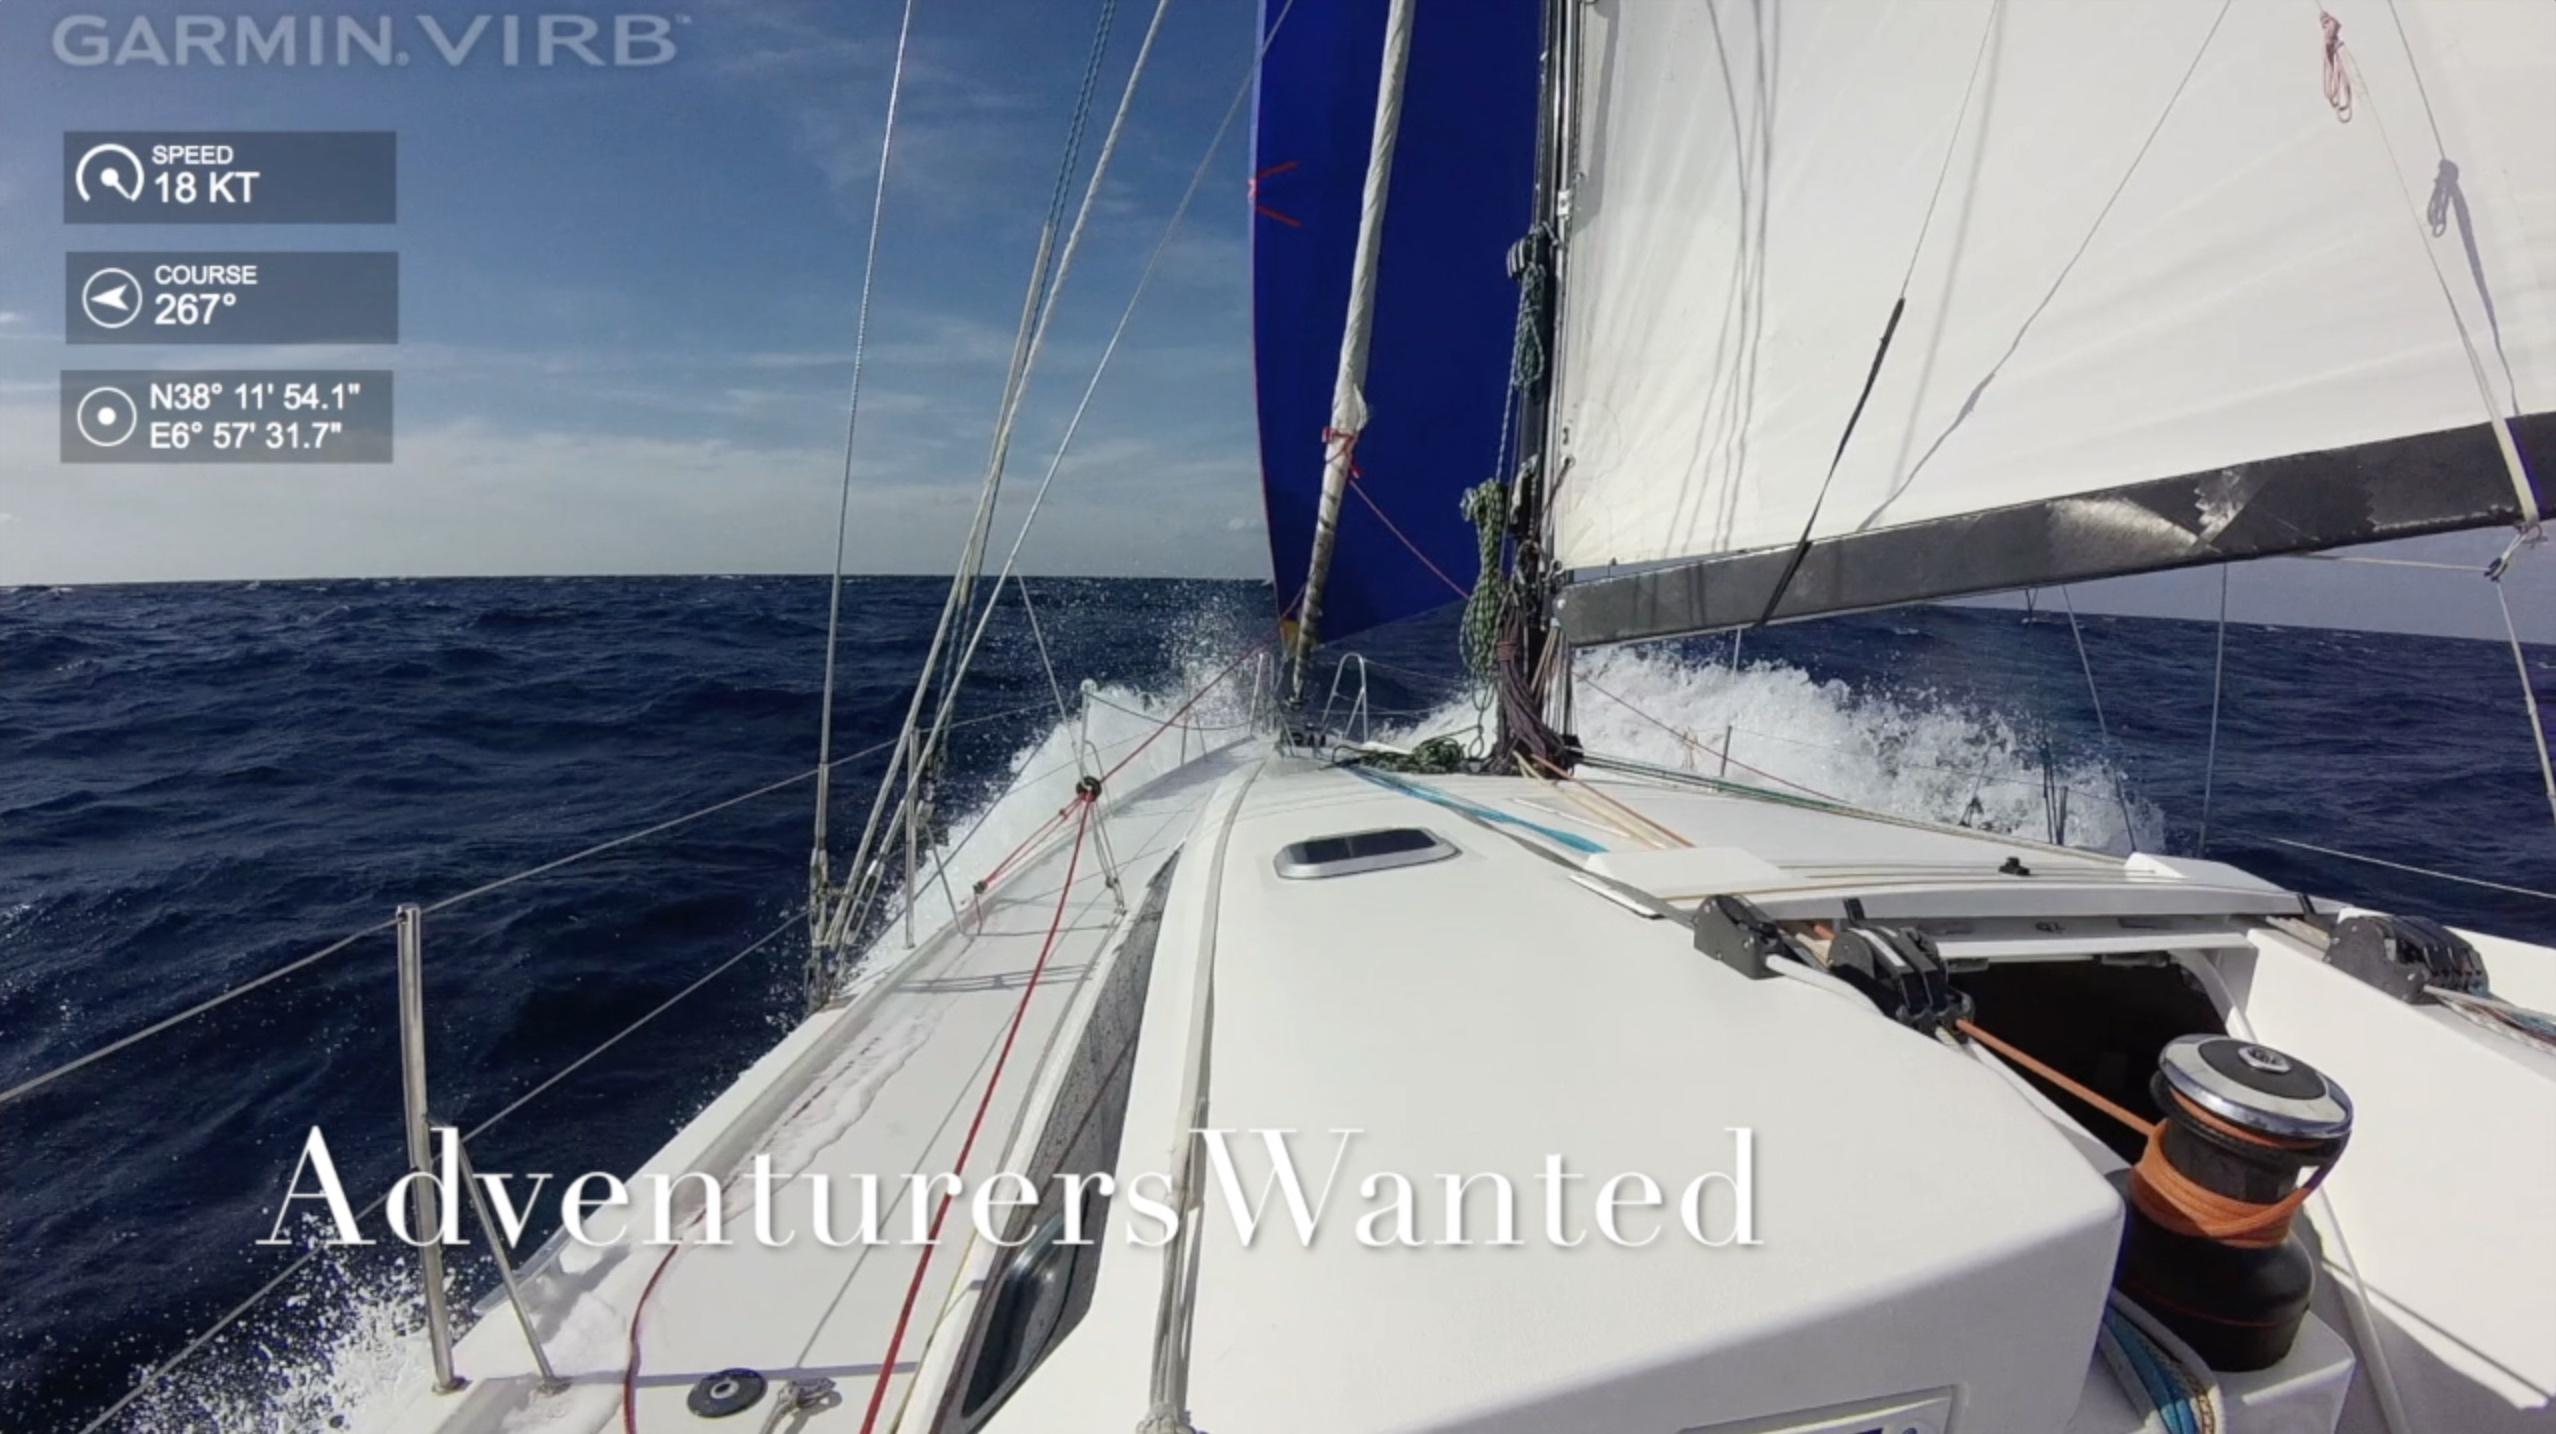 Adventure: Crossing the Mediterranean